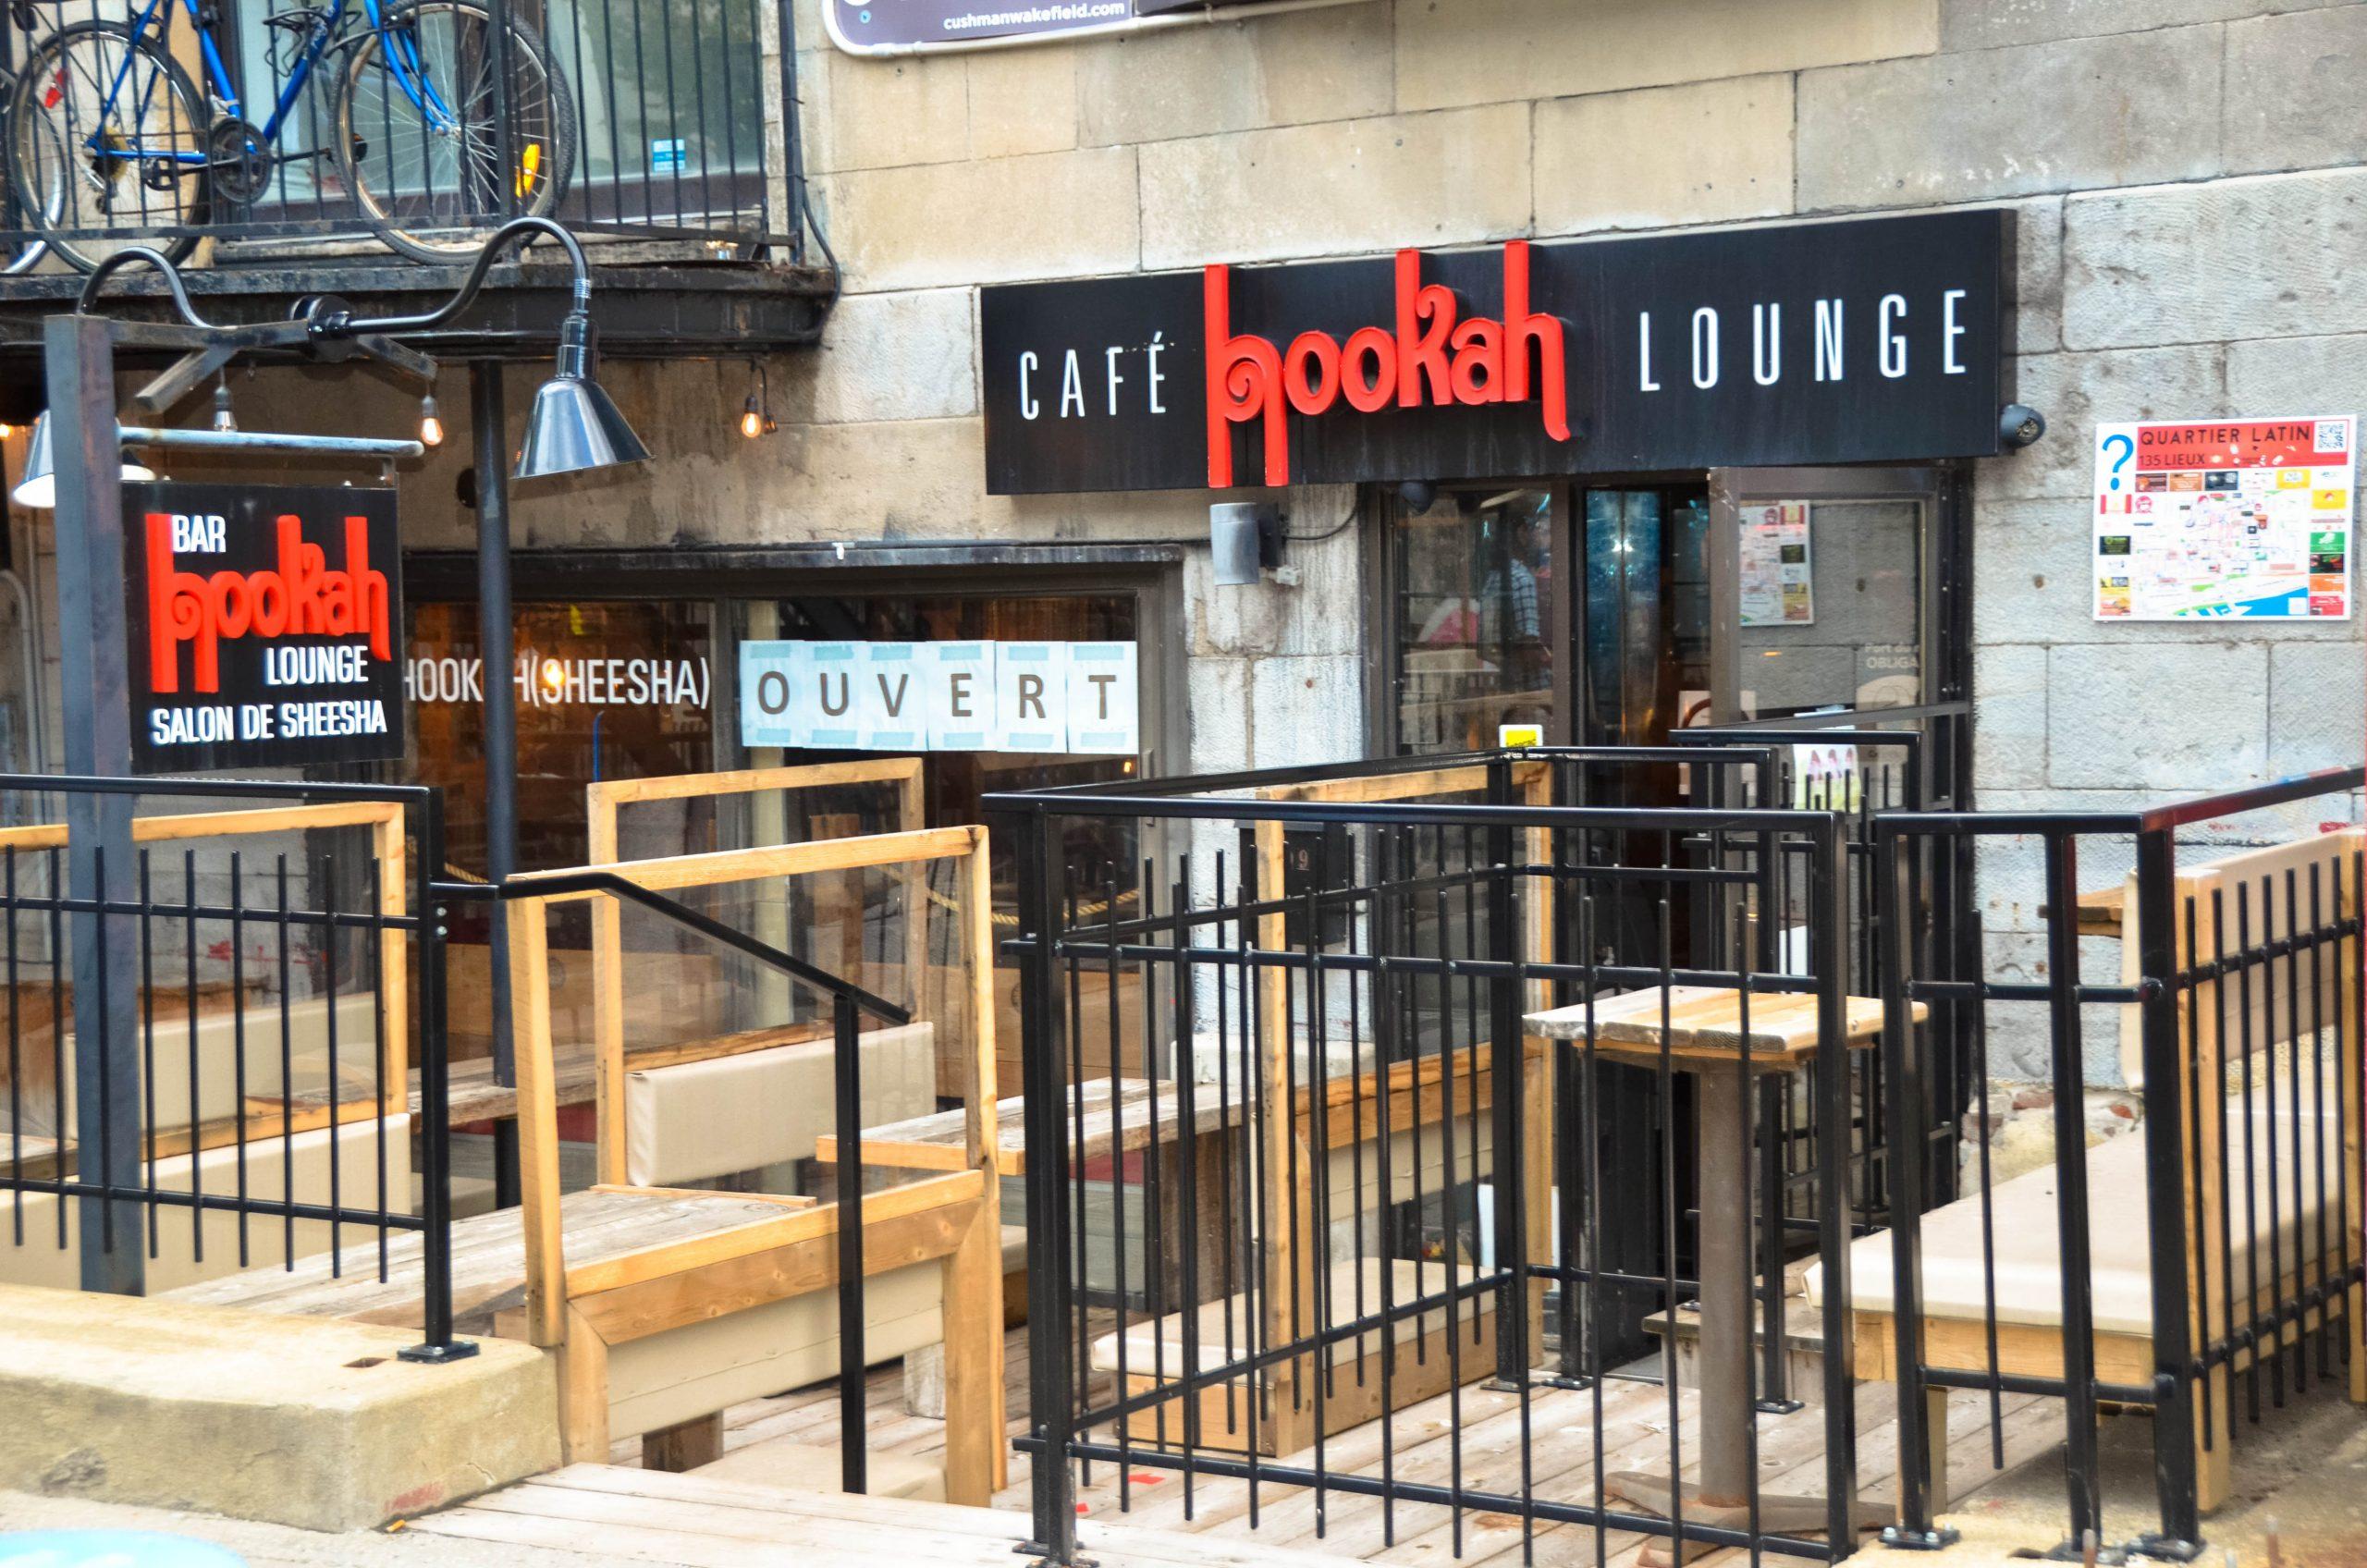 Café Hookah Lounge